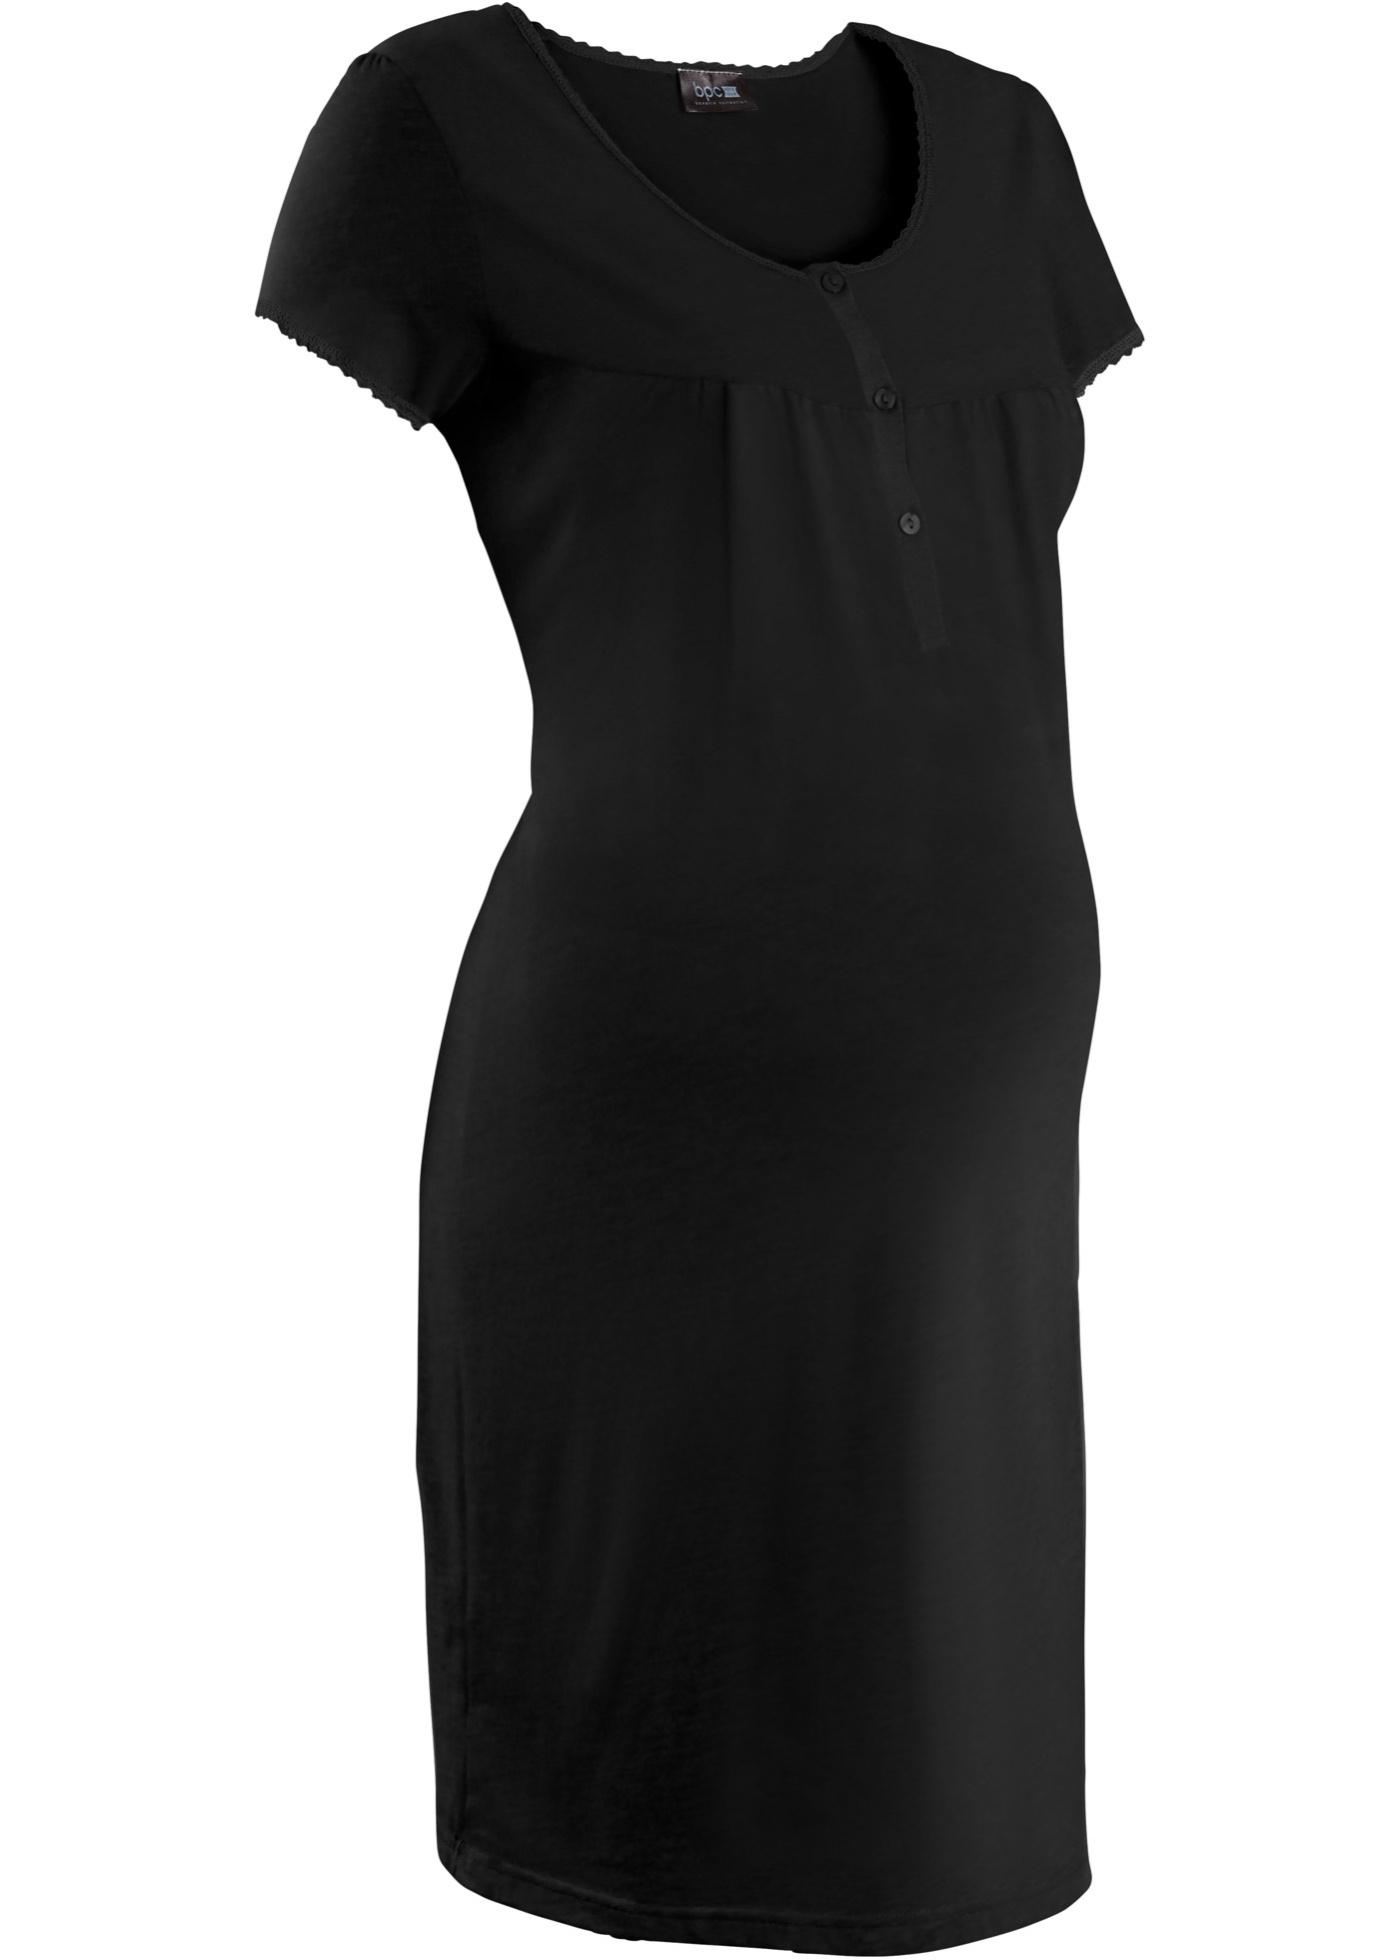 Camicia da notte prémaman (Nero) - bpc bonprix collection - Nice Size